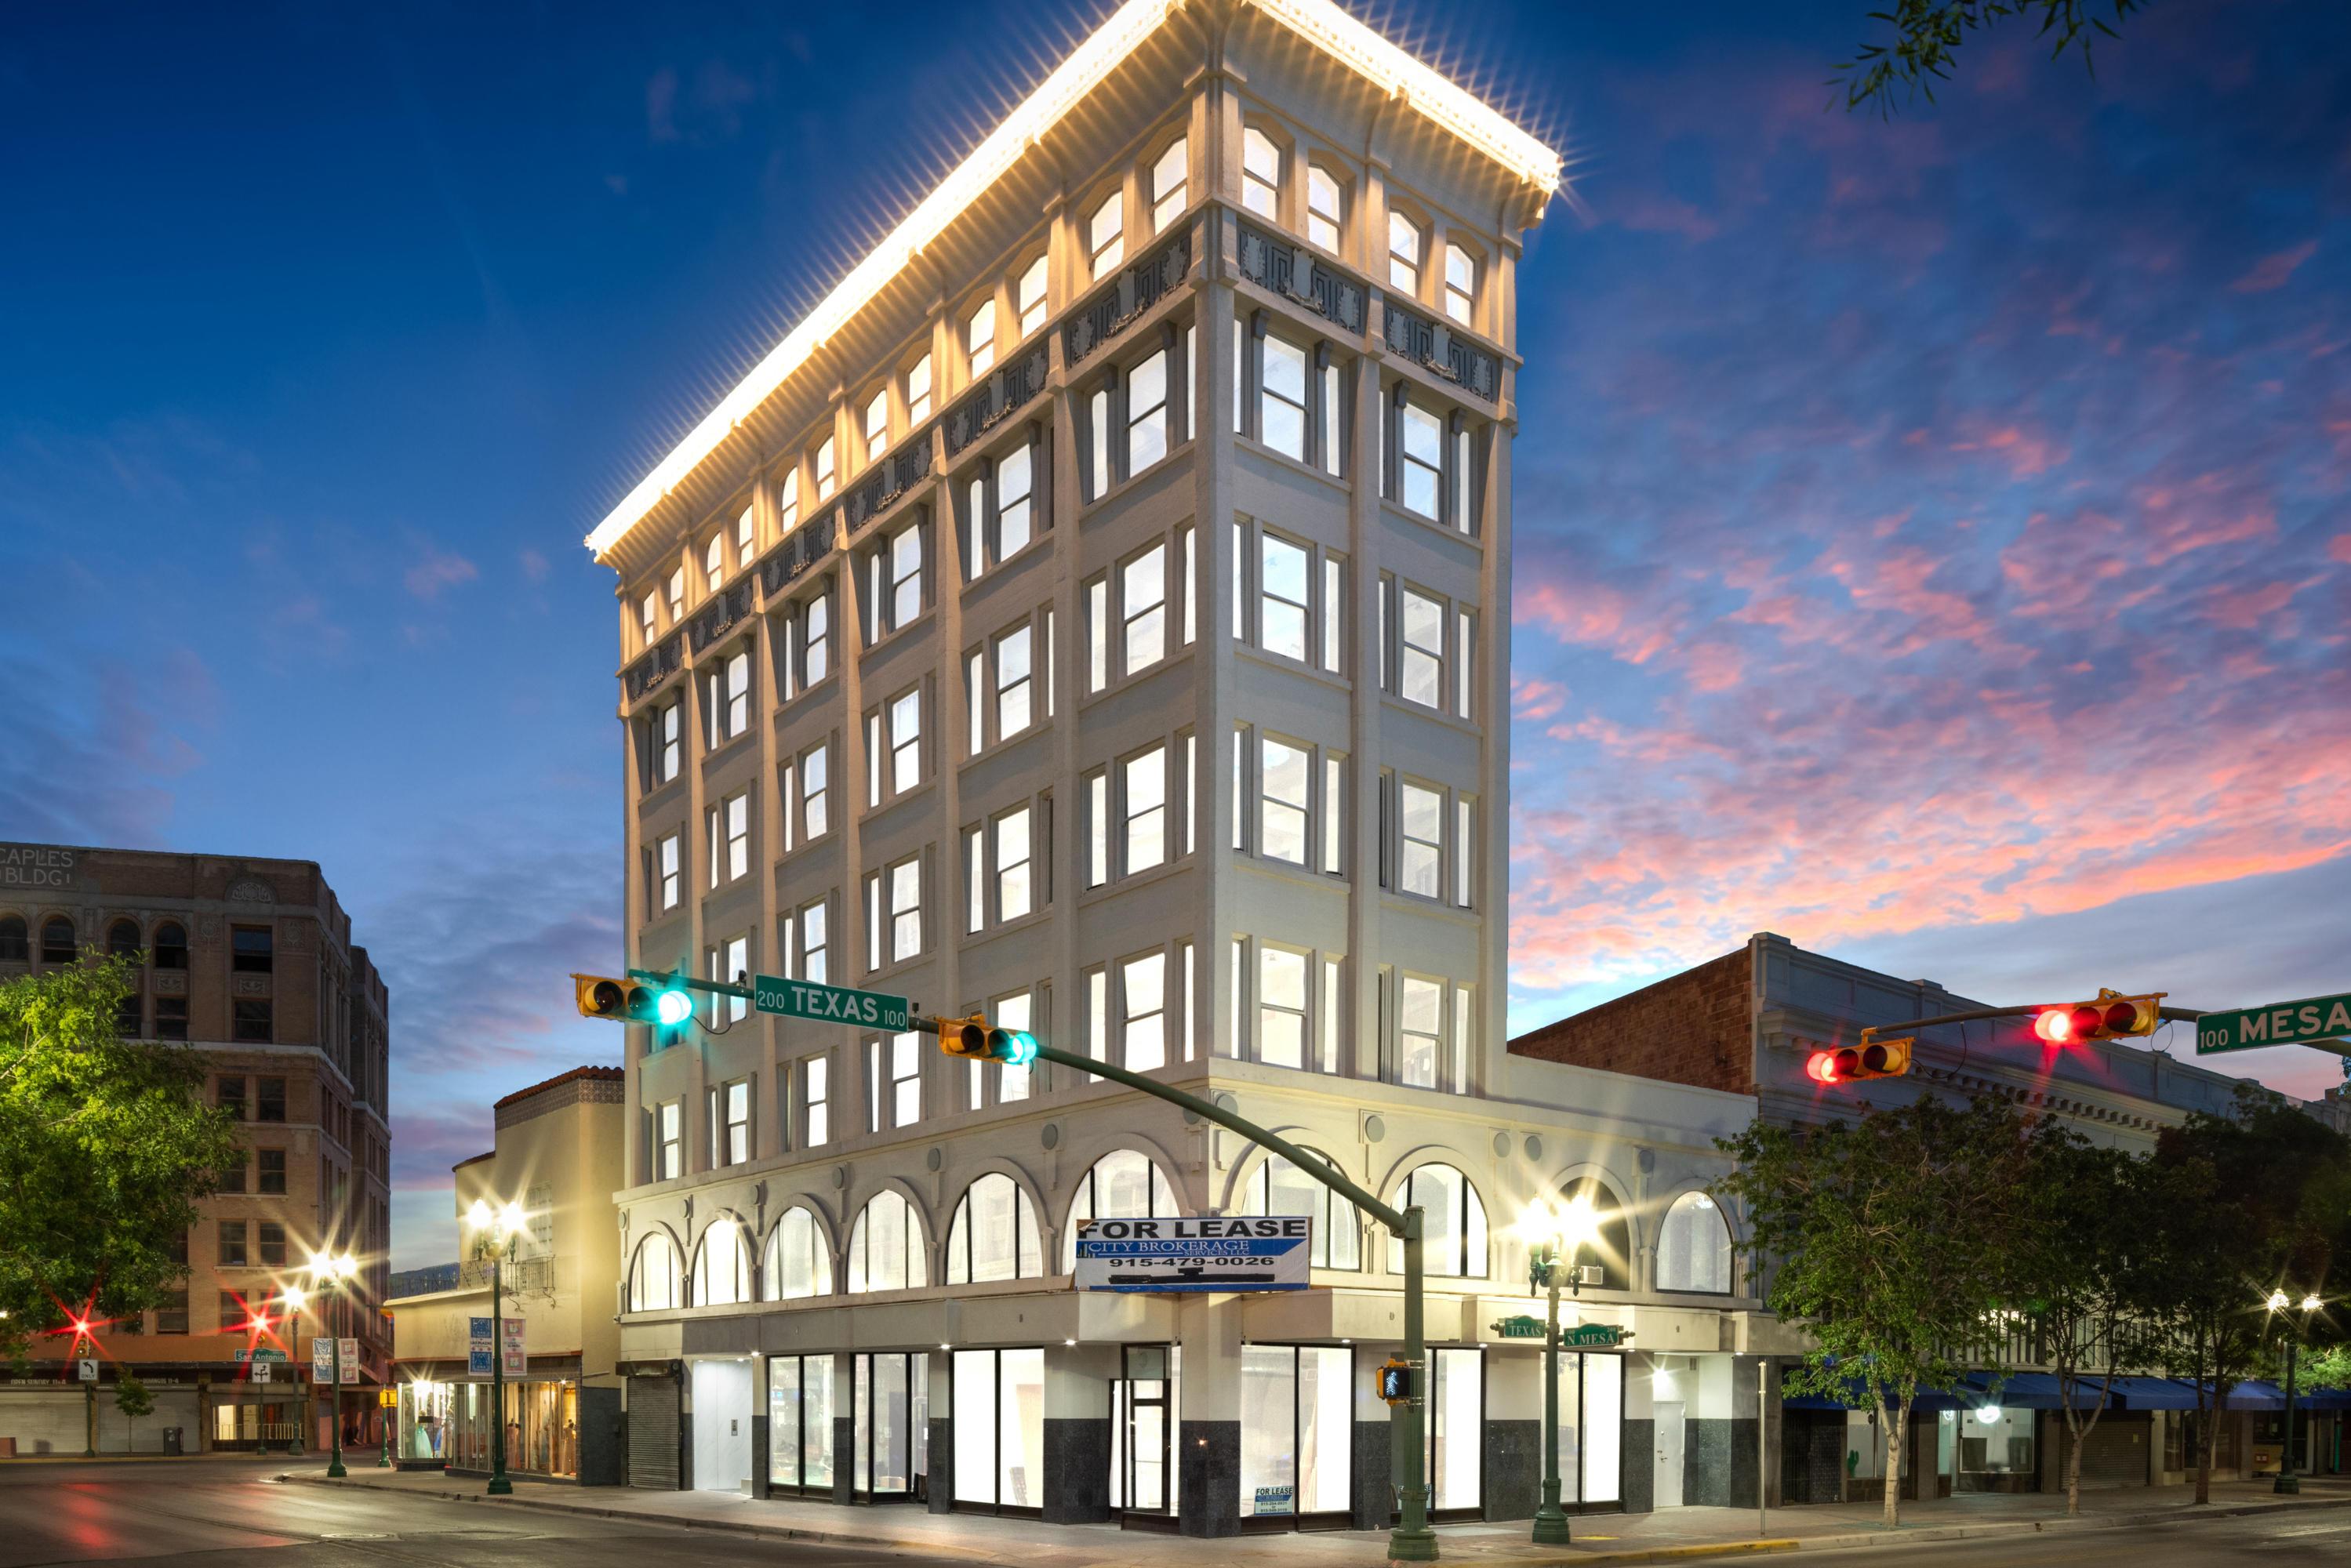 115 Mesa Street, El Paso, Texas 79901, ,Commercial,For sale,Mesa,821301